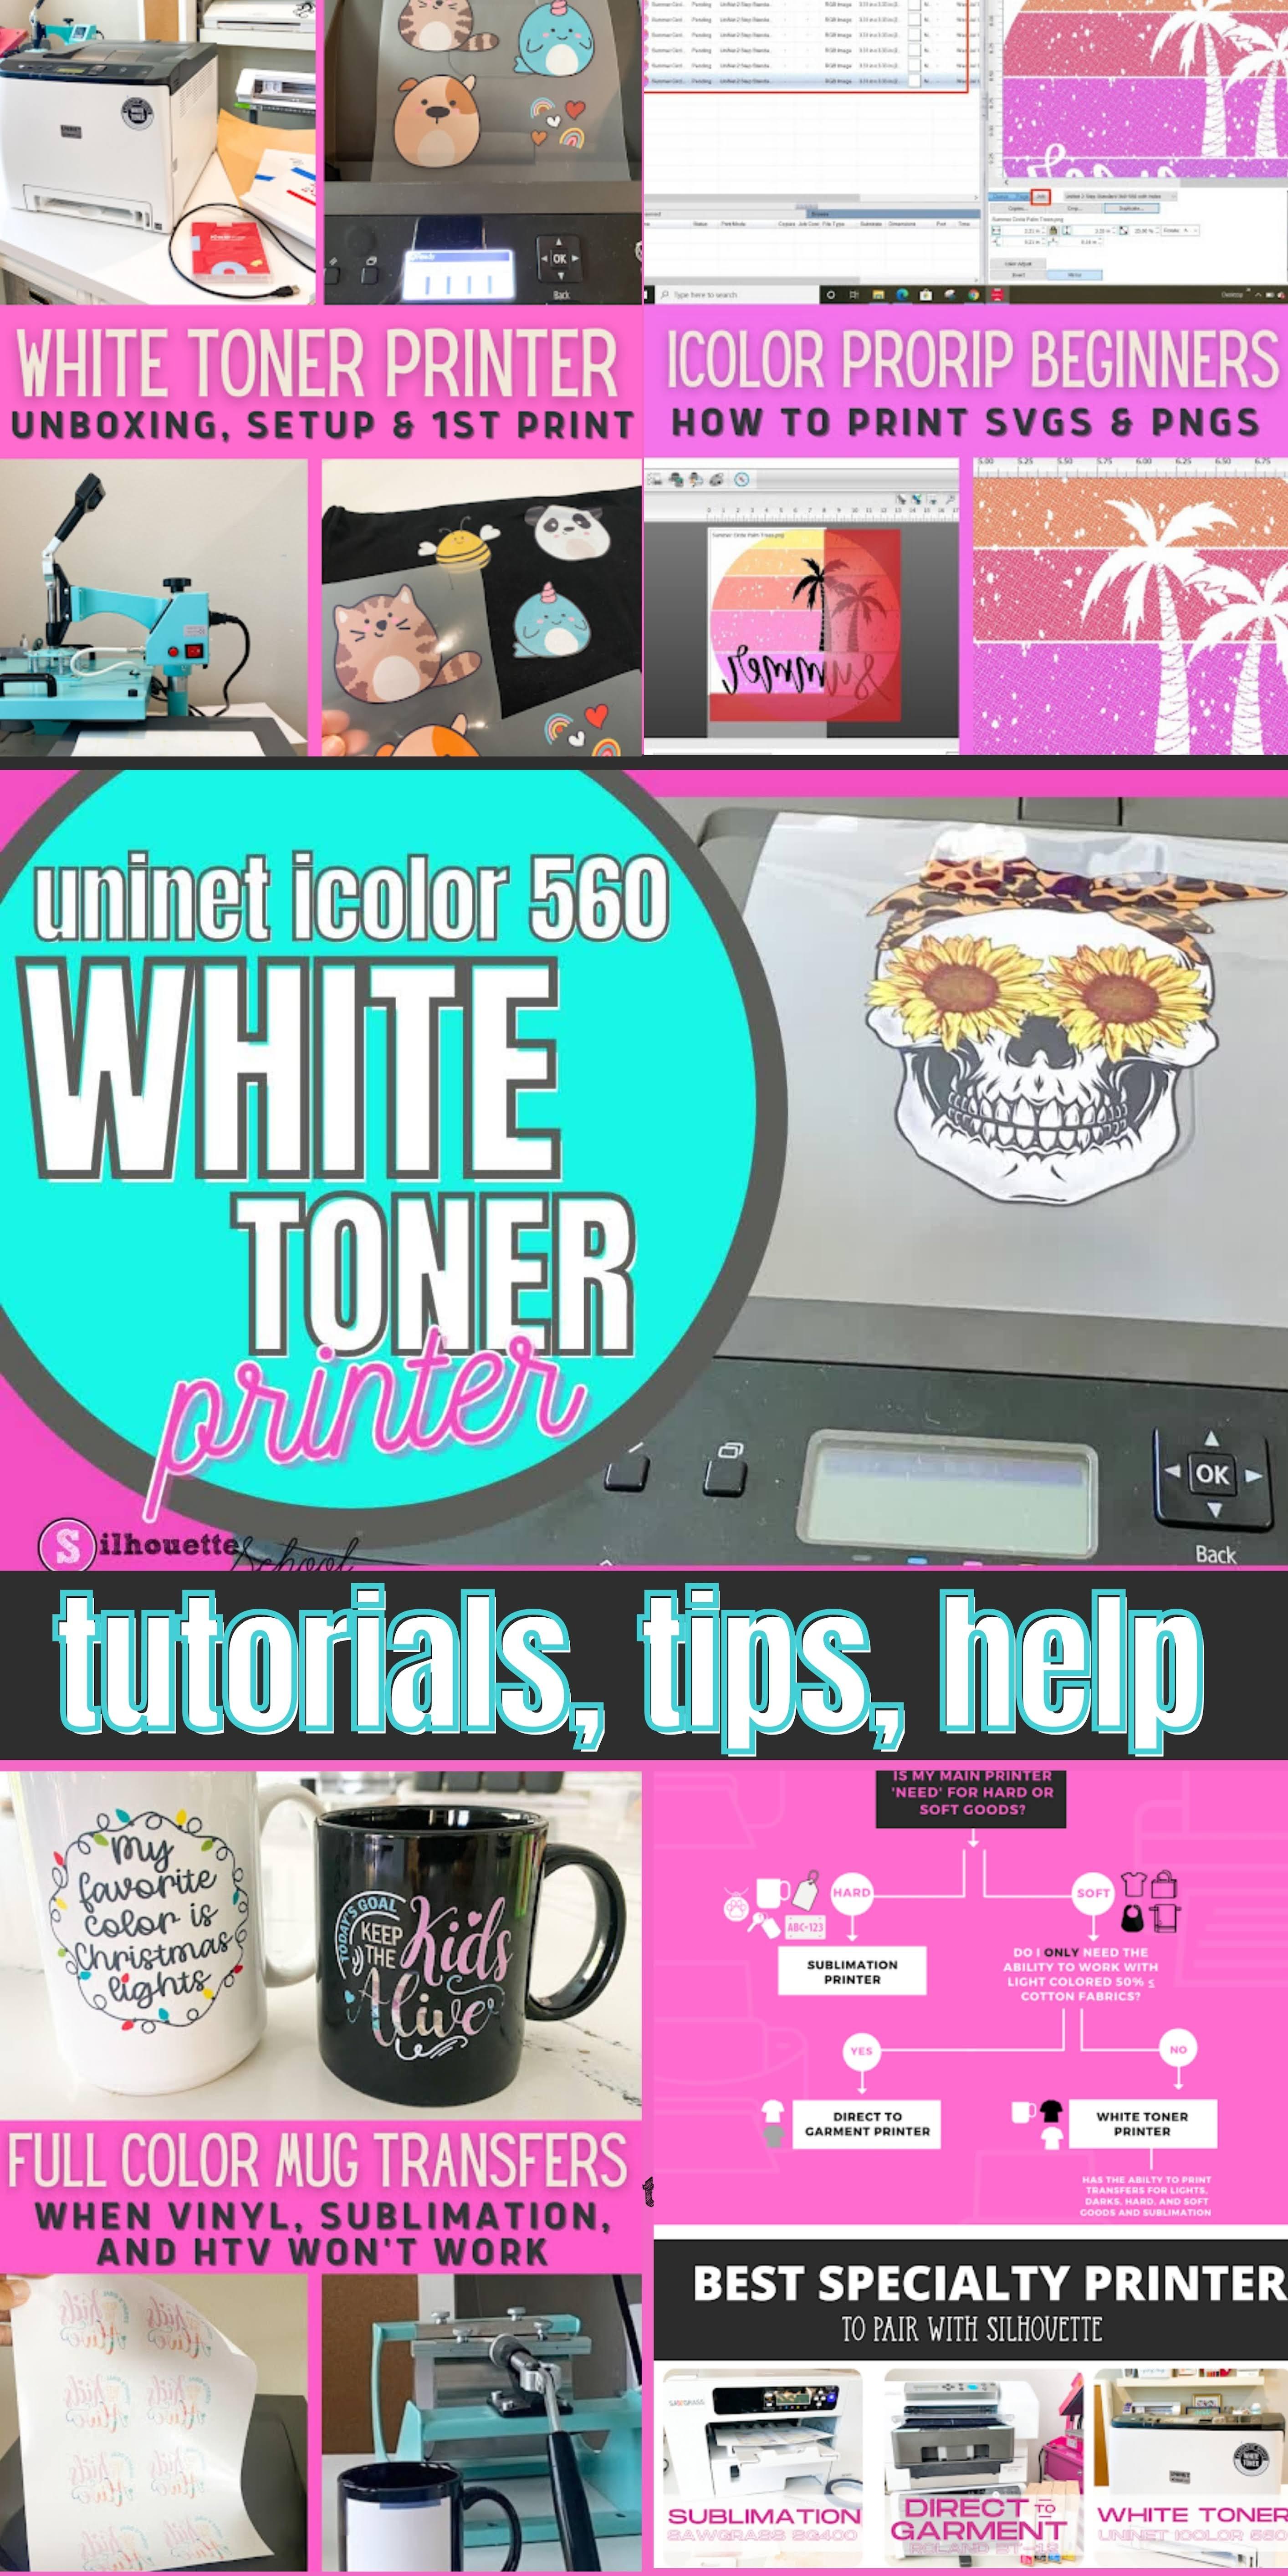 Uninet iColor 560 printer tutorials